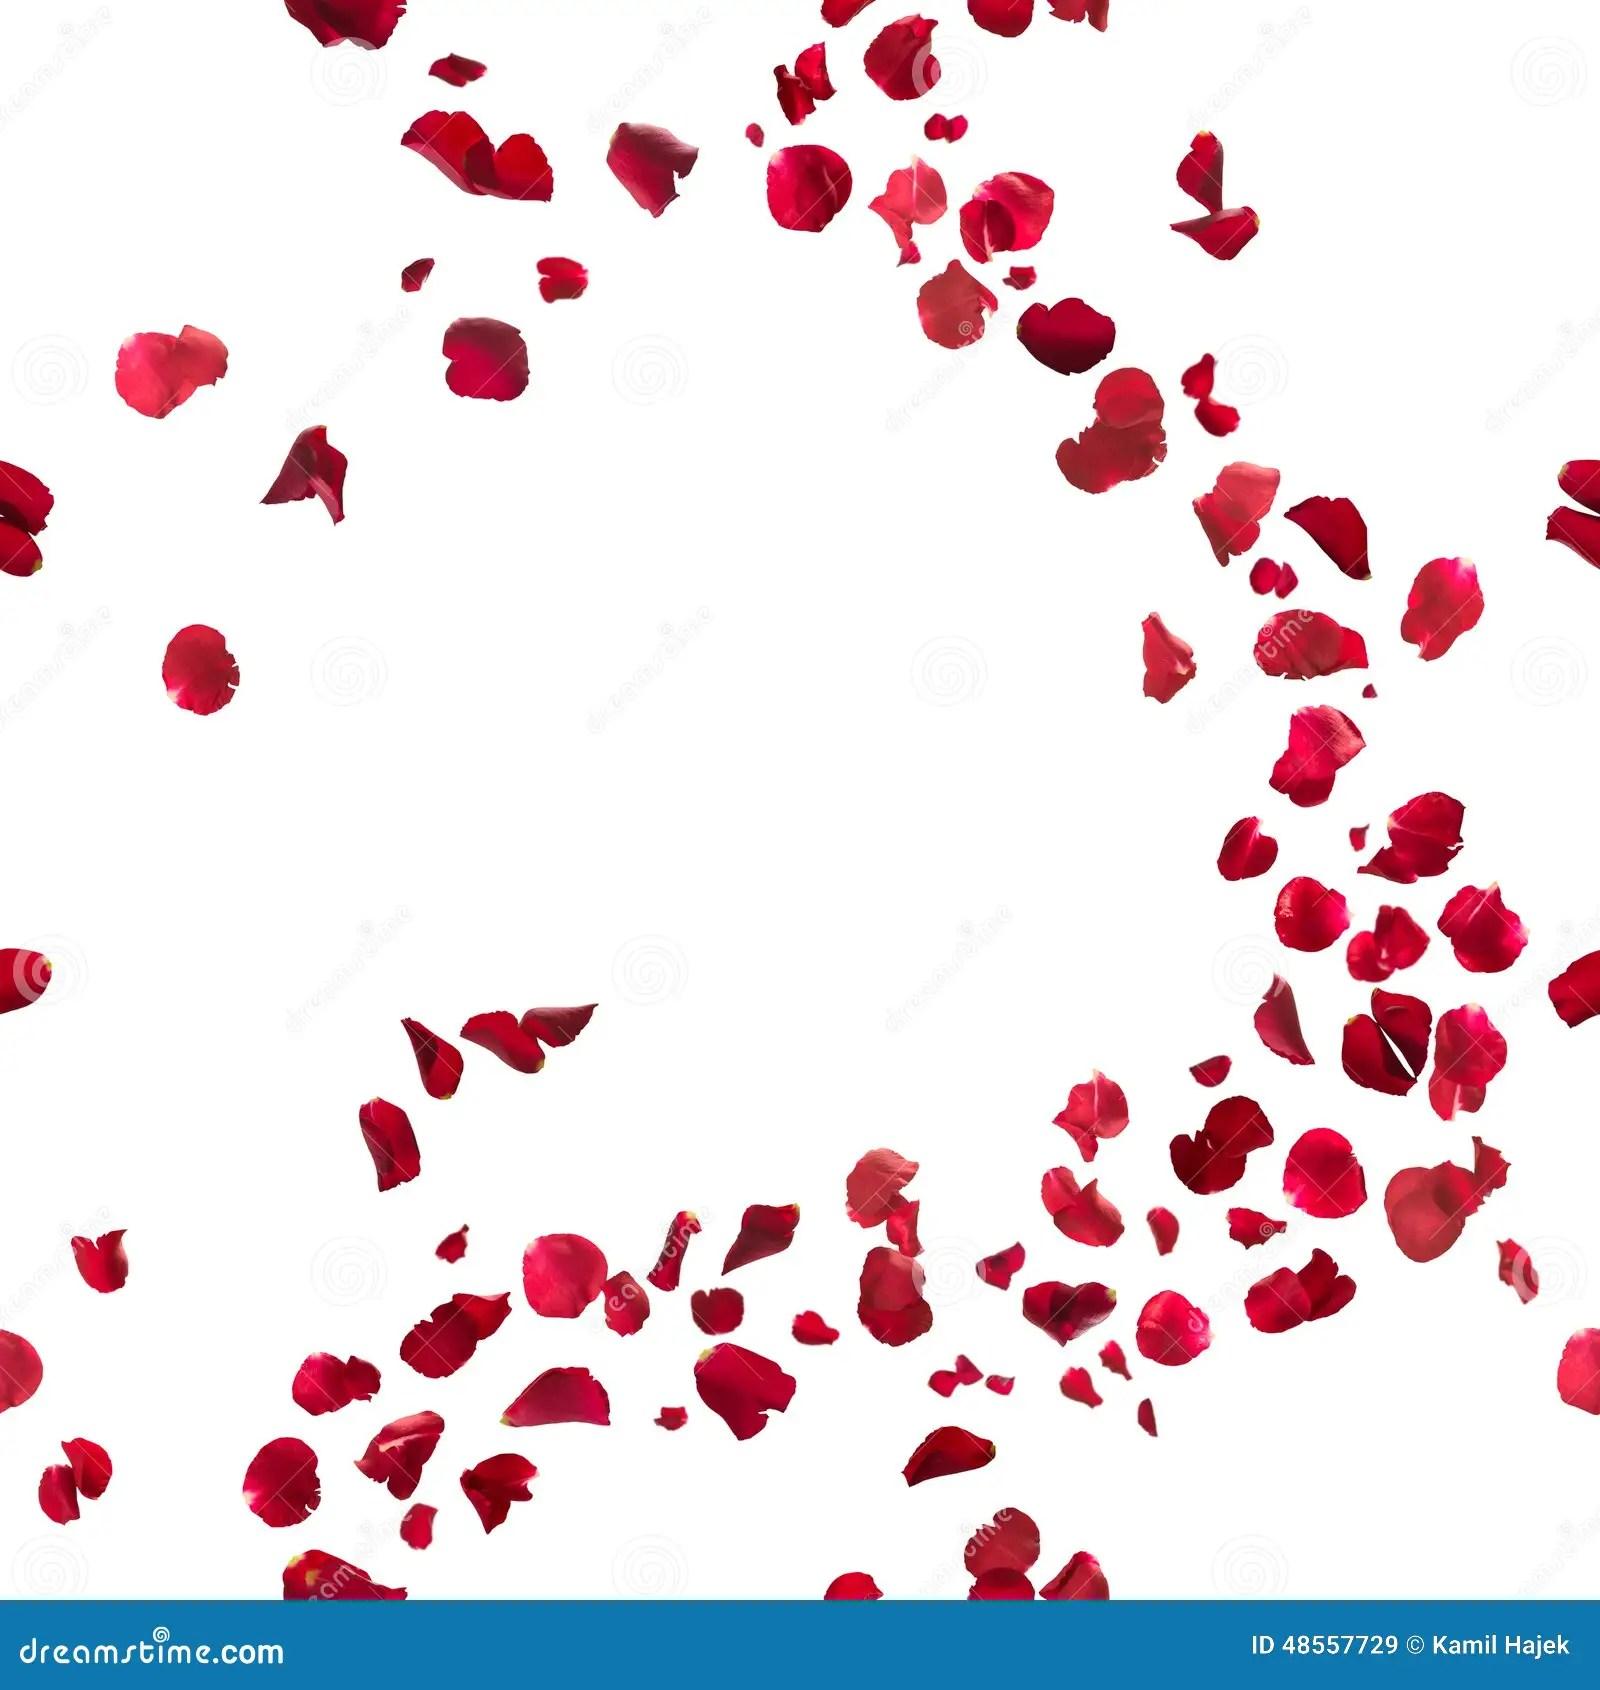 Falling Rose Petals Wallpaper Seamless Red Rose Petals Breeze Stock Photo Image 48557729